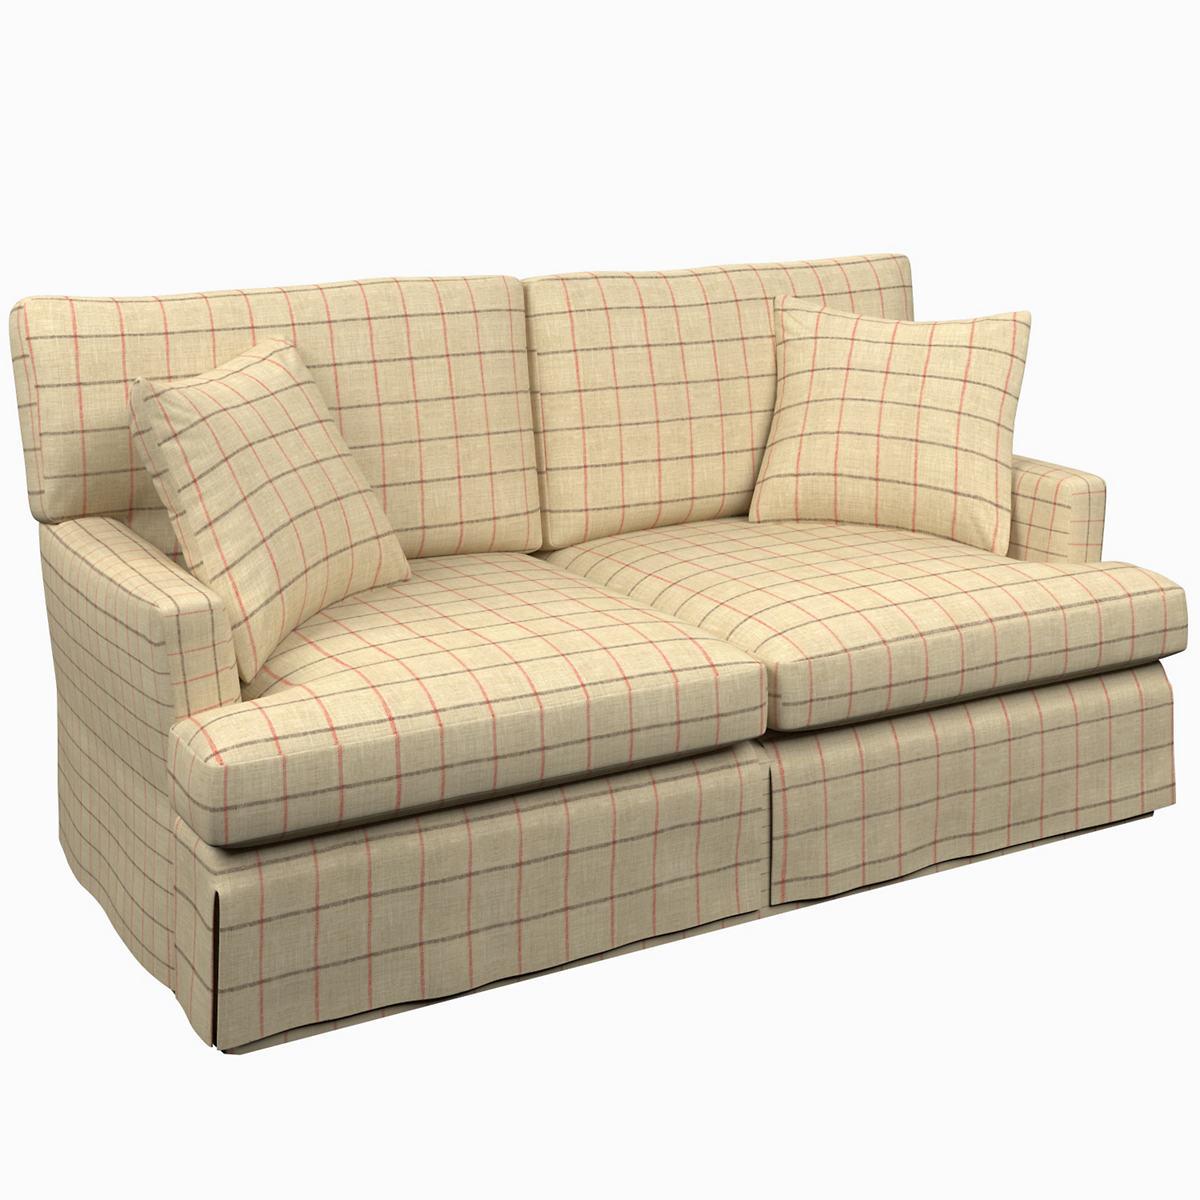 Chatham Tattersall Brick/Brown Saybrook 2 Seater Upholstered Sofa